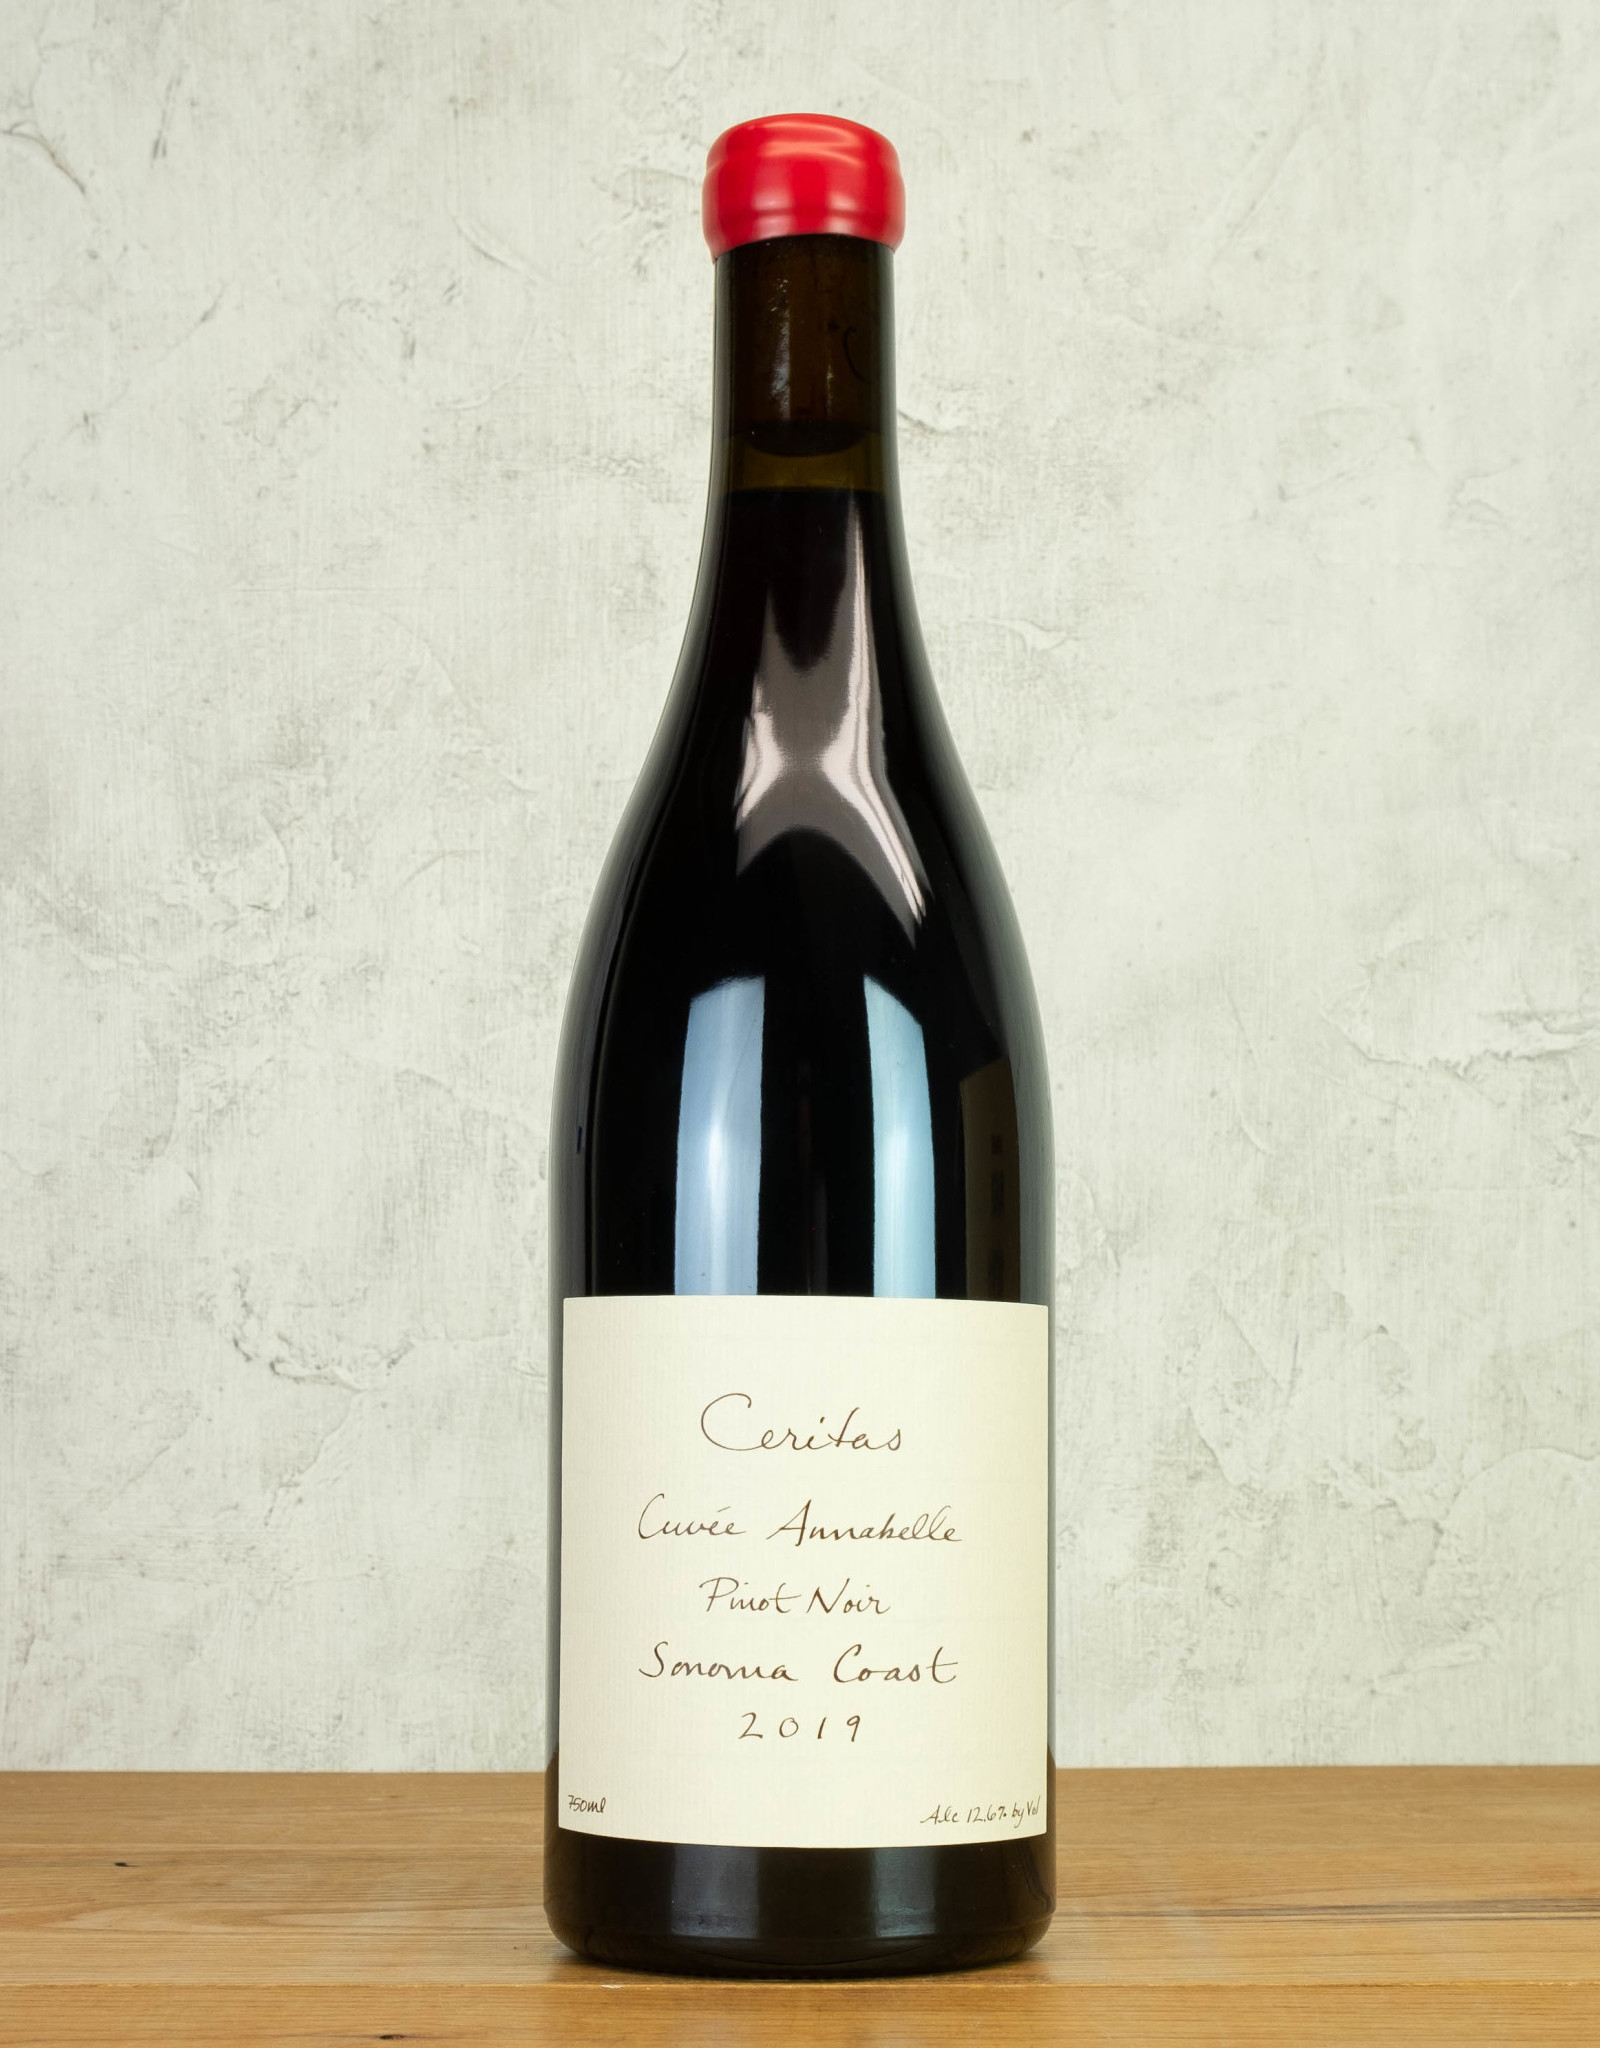 Ceritas Cuvee Annabelle Pinot Noir